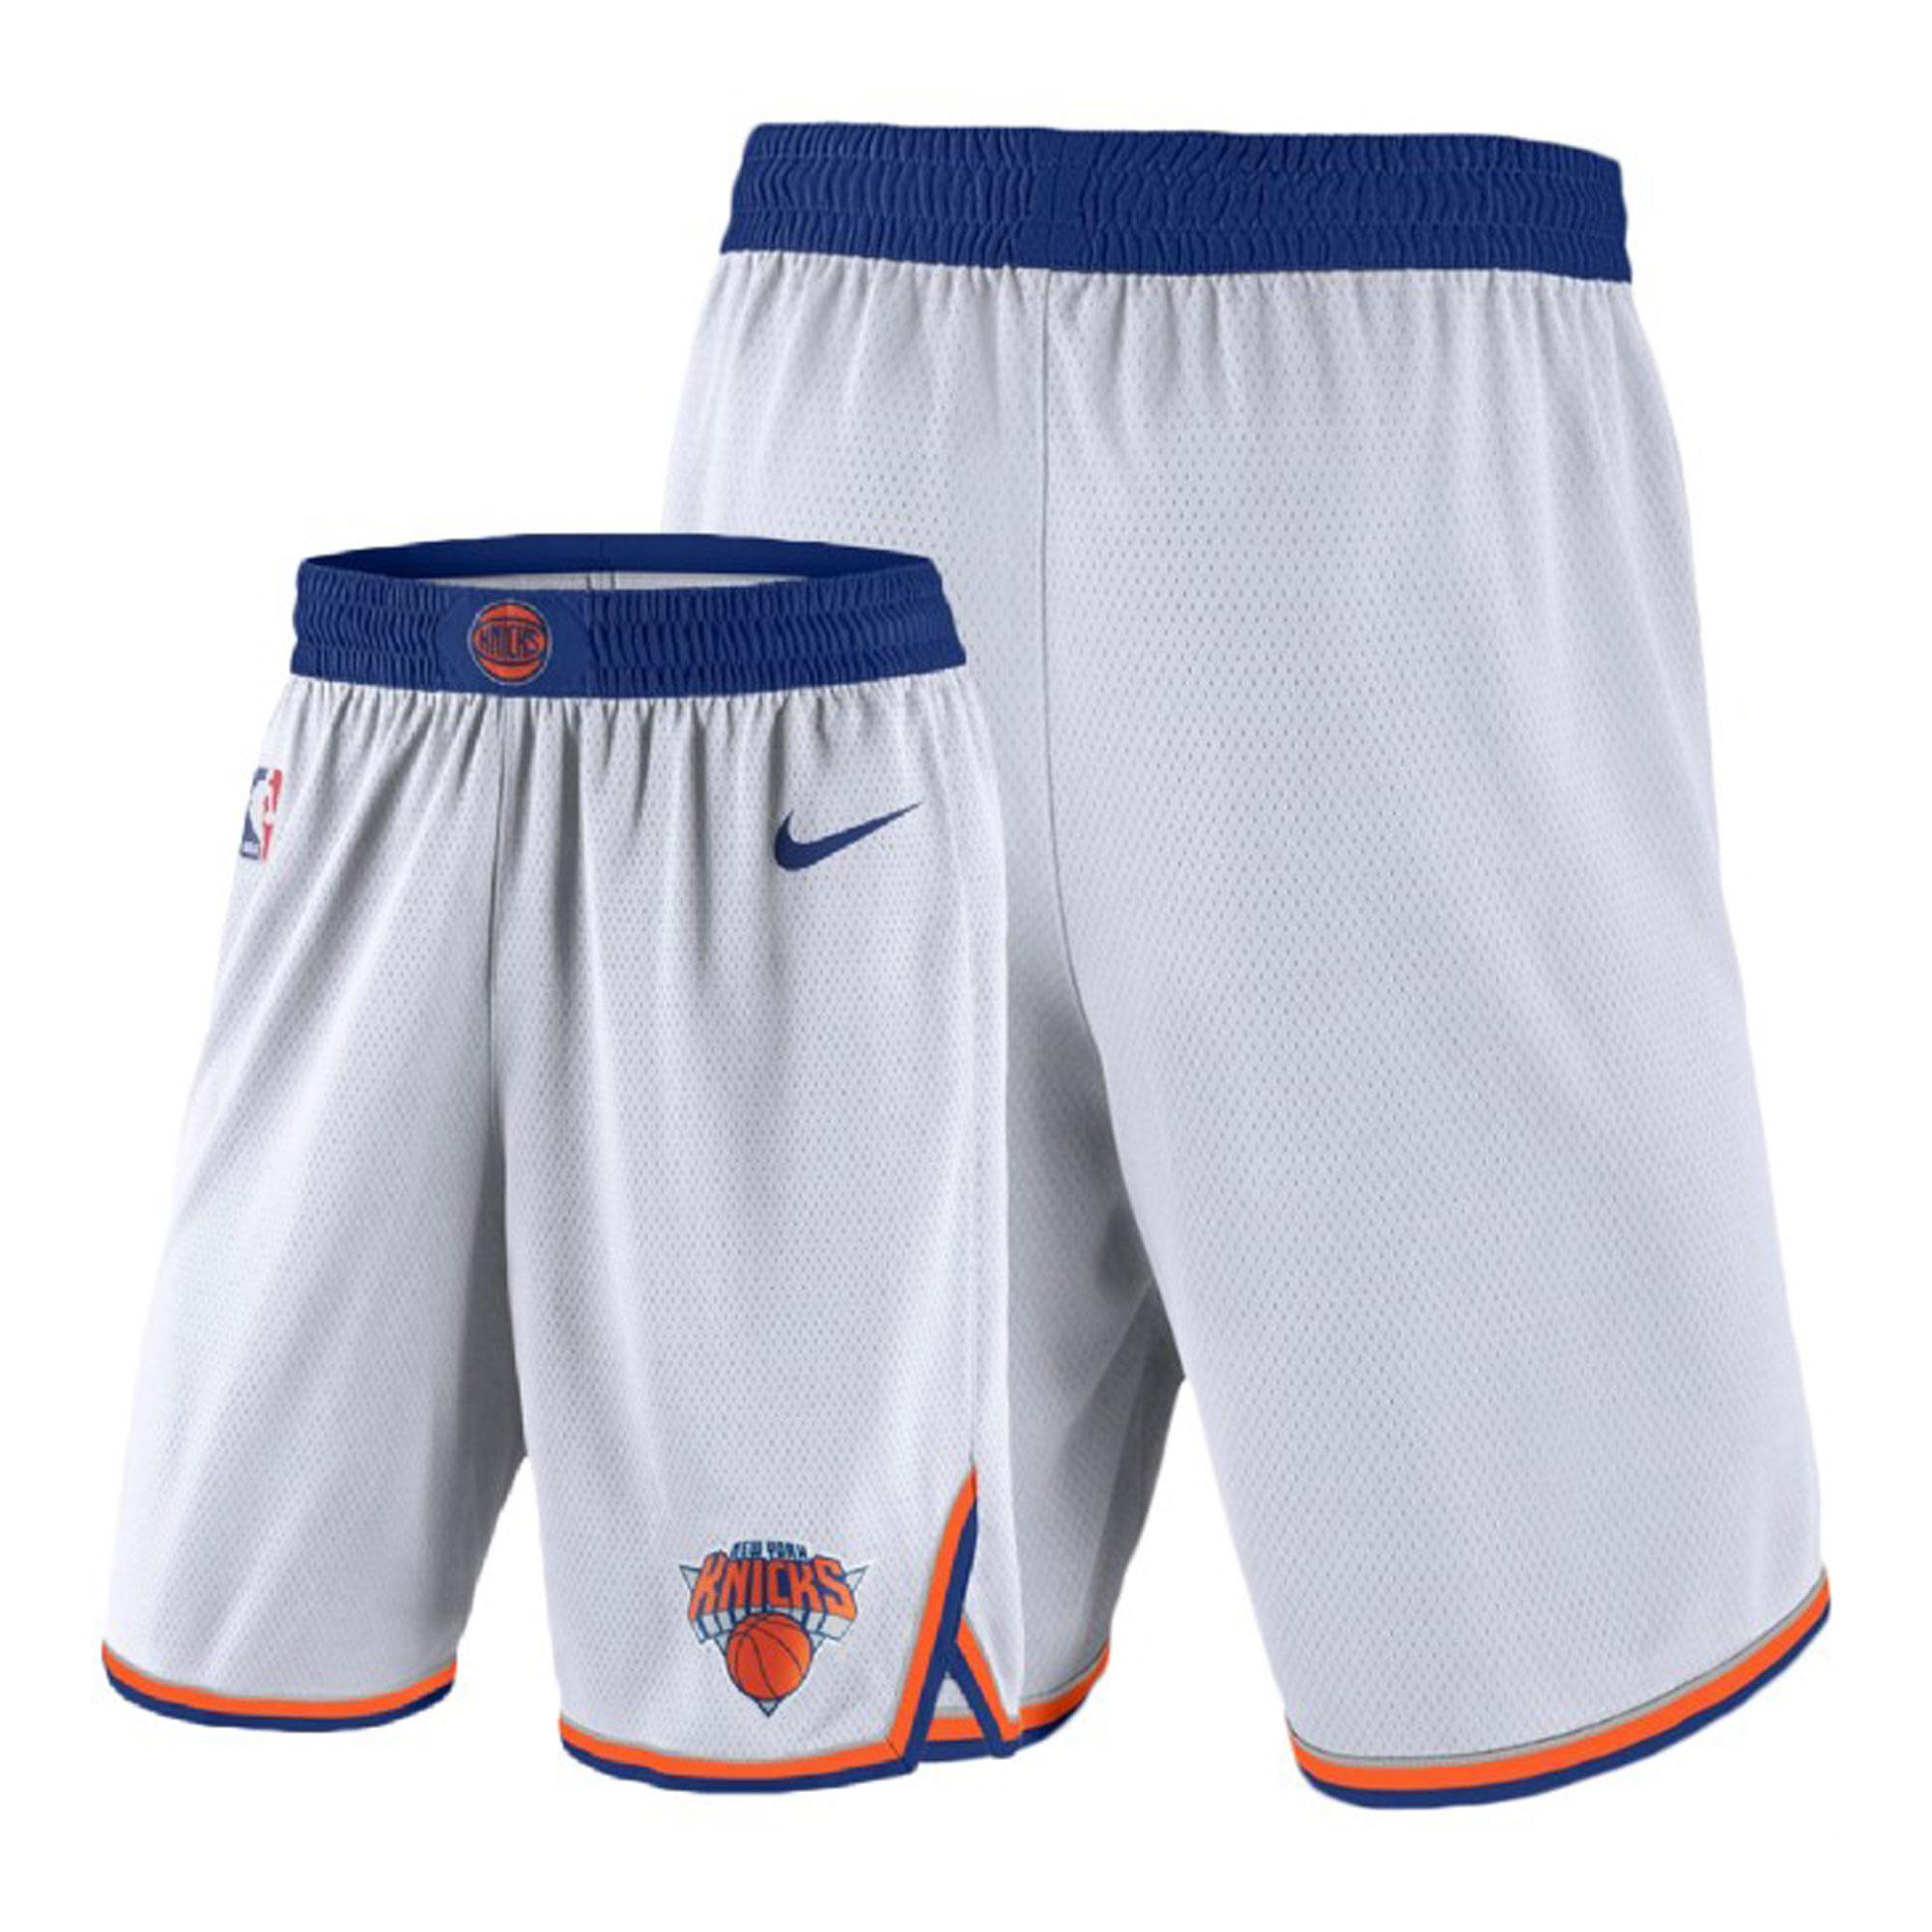 New York Knicks Short (SRT-WHT-NYK)